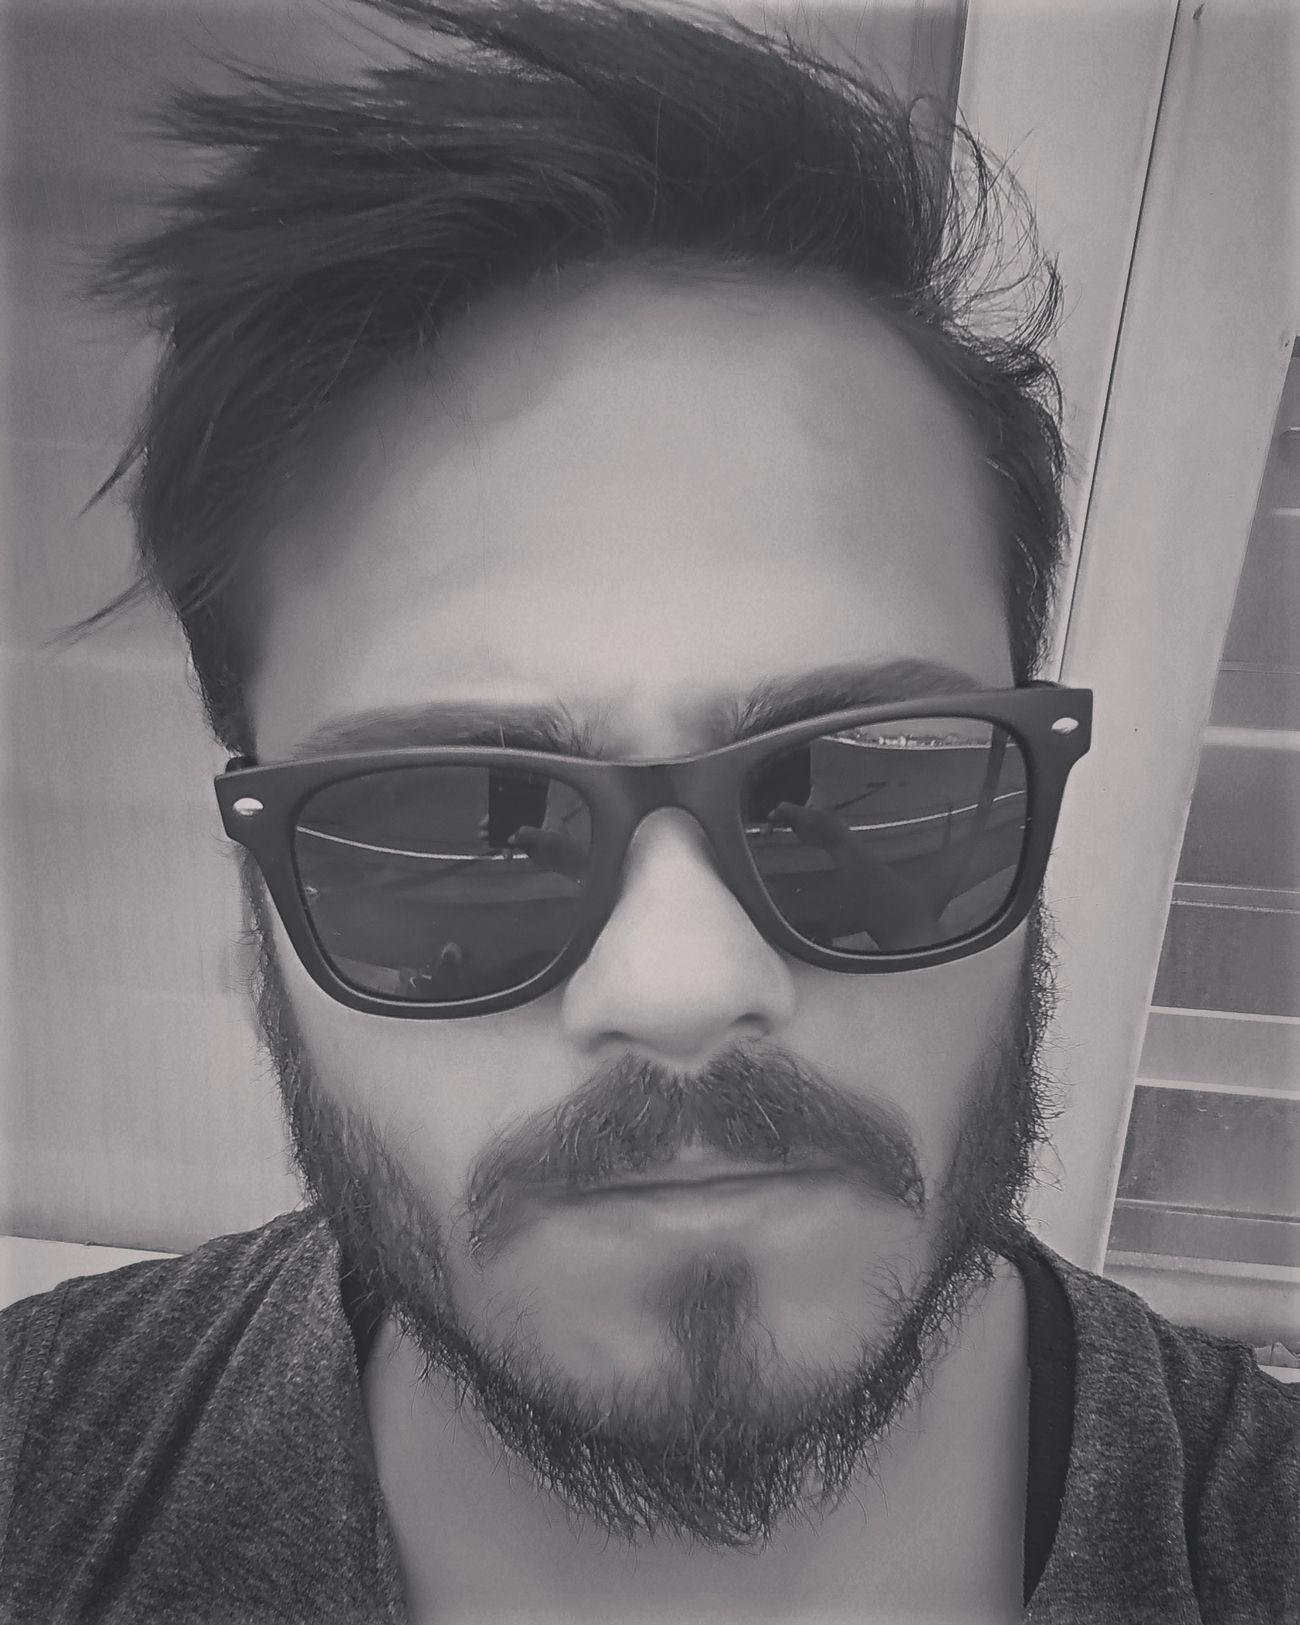 ThatsMe EyeEm Best Shots Beard Blackandwhite Hello World Selfie ✌ Sakal First Eyeem Photo Thats Me  Follow EyeEm Türkiye Turkeyphotooftheday Followme EyeEm Gallery Gozluk Glasses EyeEm Best Edits Me Gülümse :) EyeEm Nature Lover Ben Self Portrait Turkey🙈😊 Model